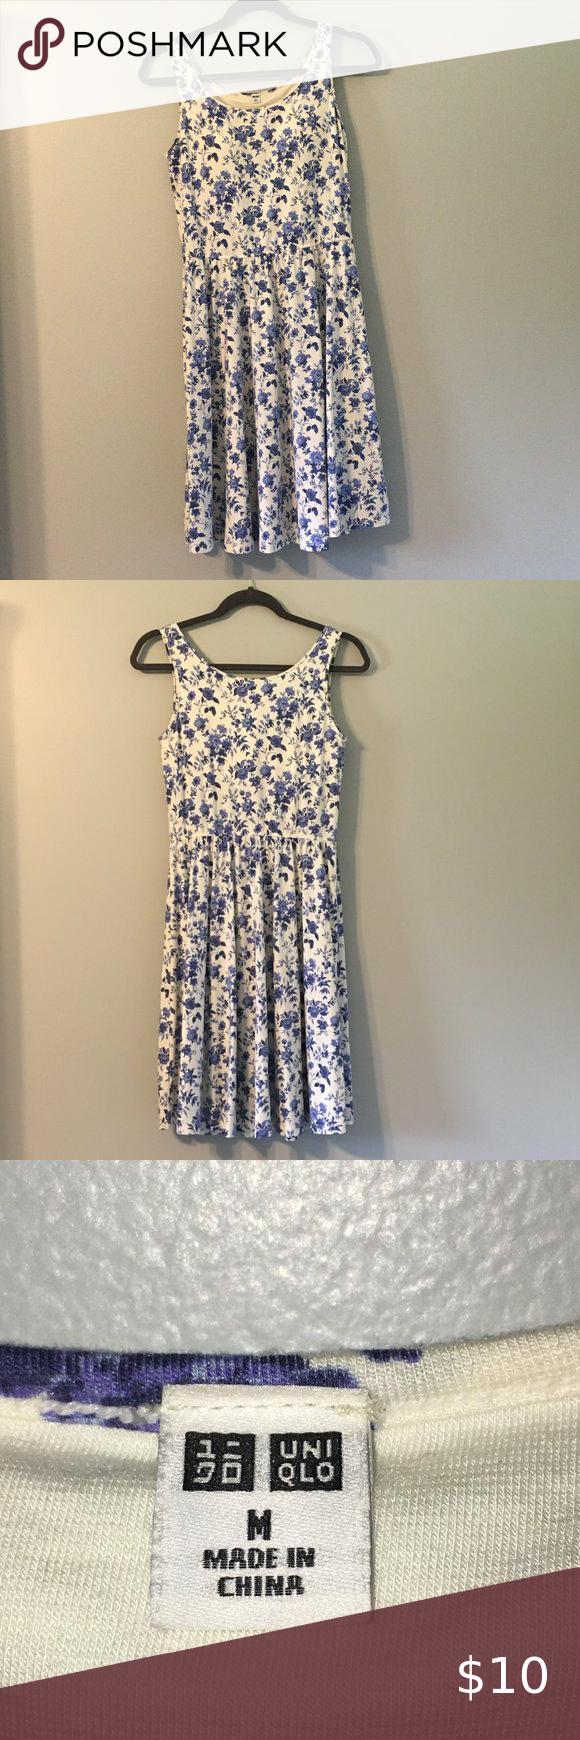 Uniqlo Sleeveless Dress W Built In Bra Comfy Summer Dresses Uniqlo Dresses Sleeveless Dress [ 1740 x 580 Pixel ]